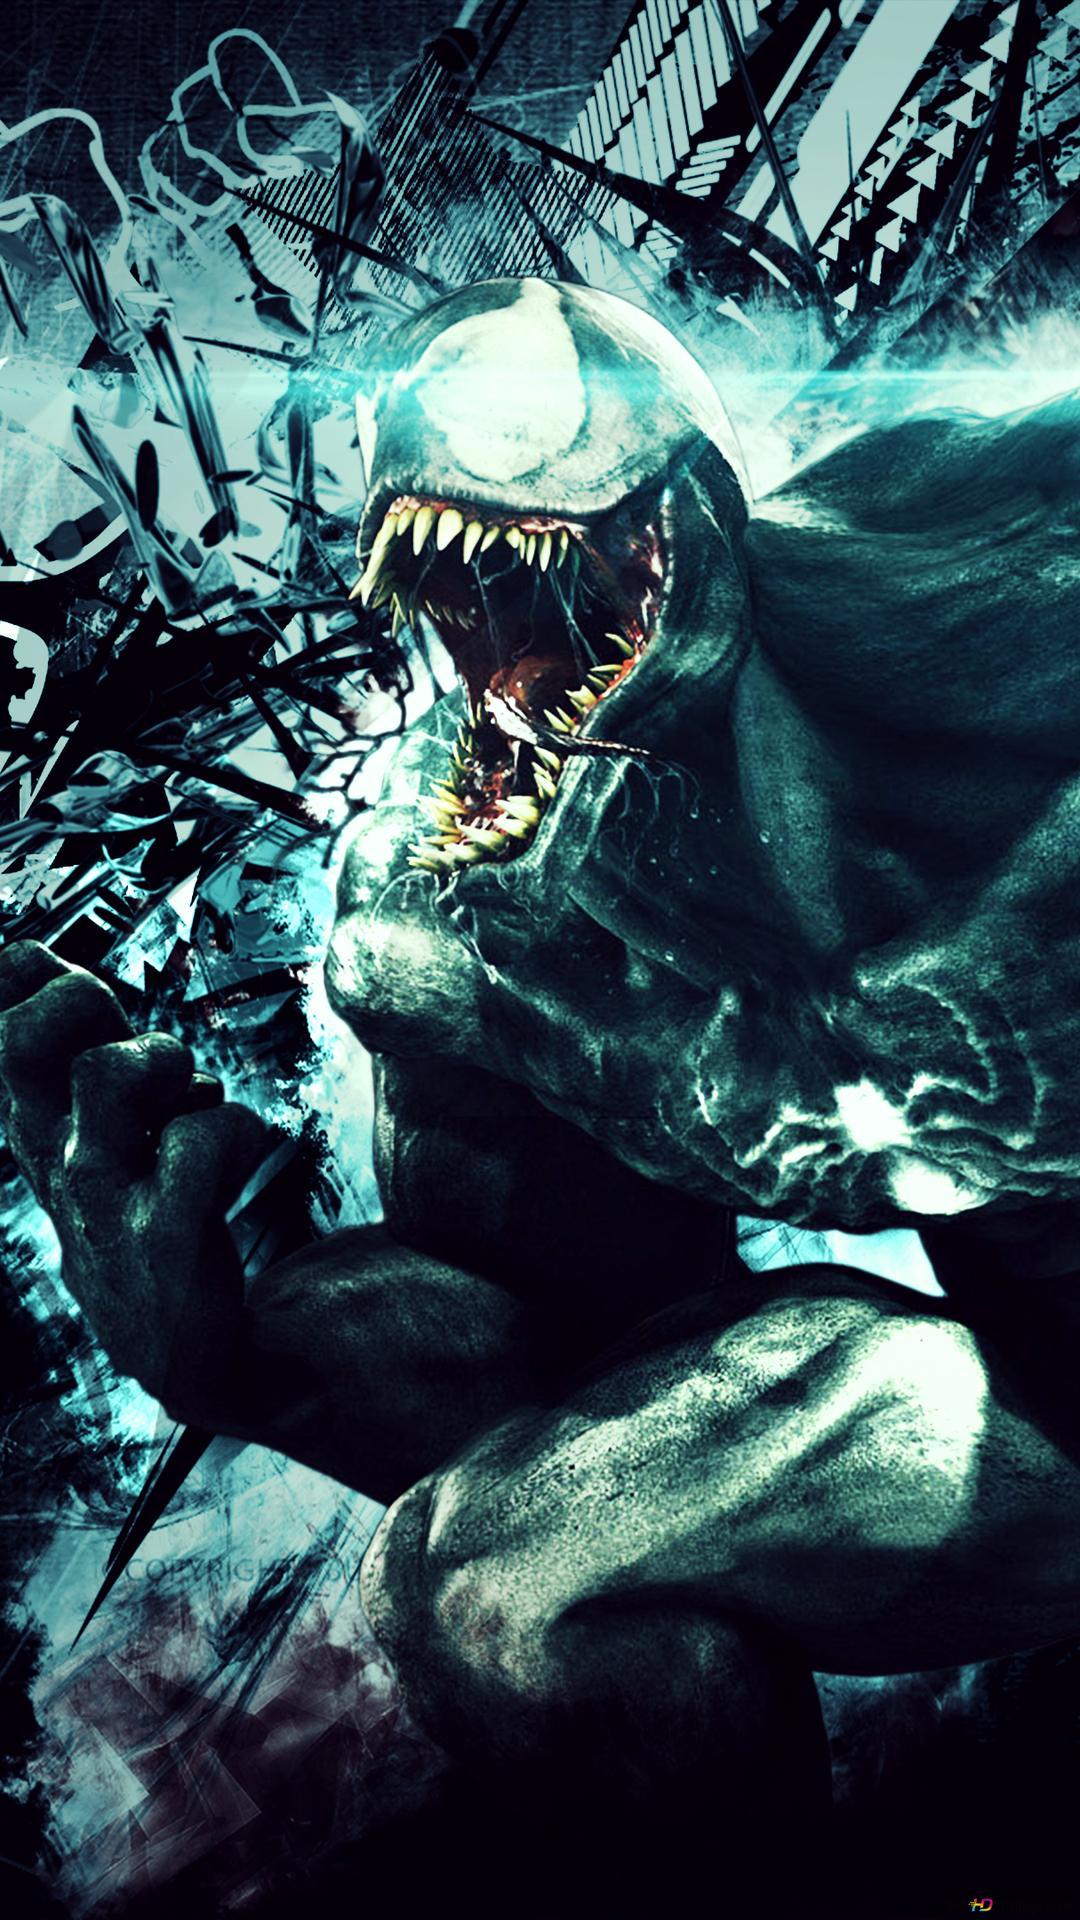 Comics Venom Symbiote Hd Wallpaper Download